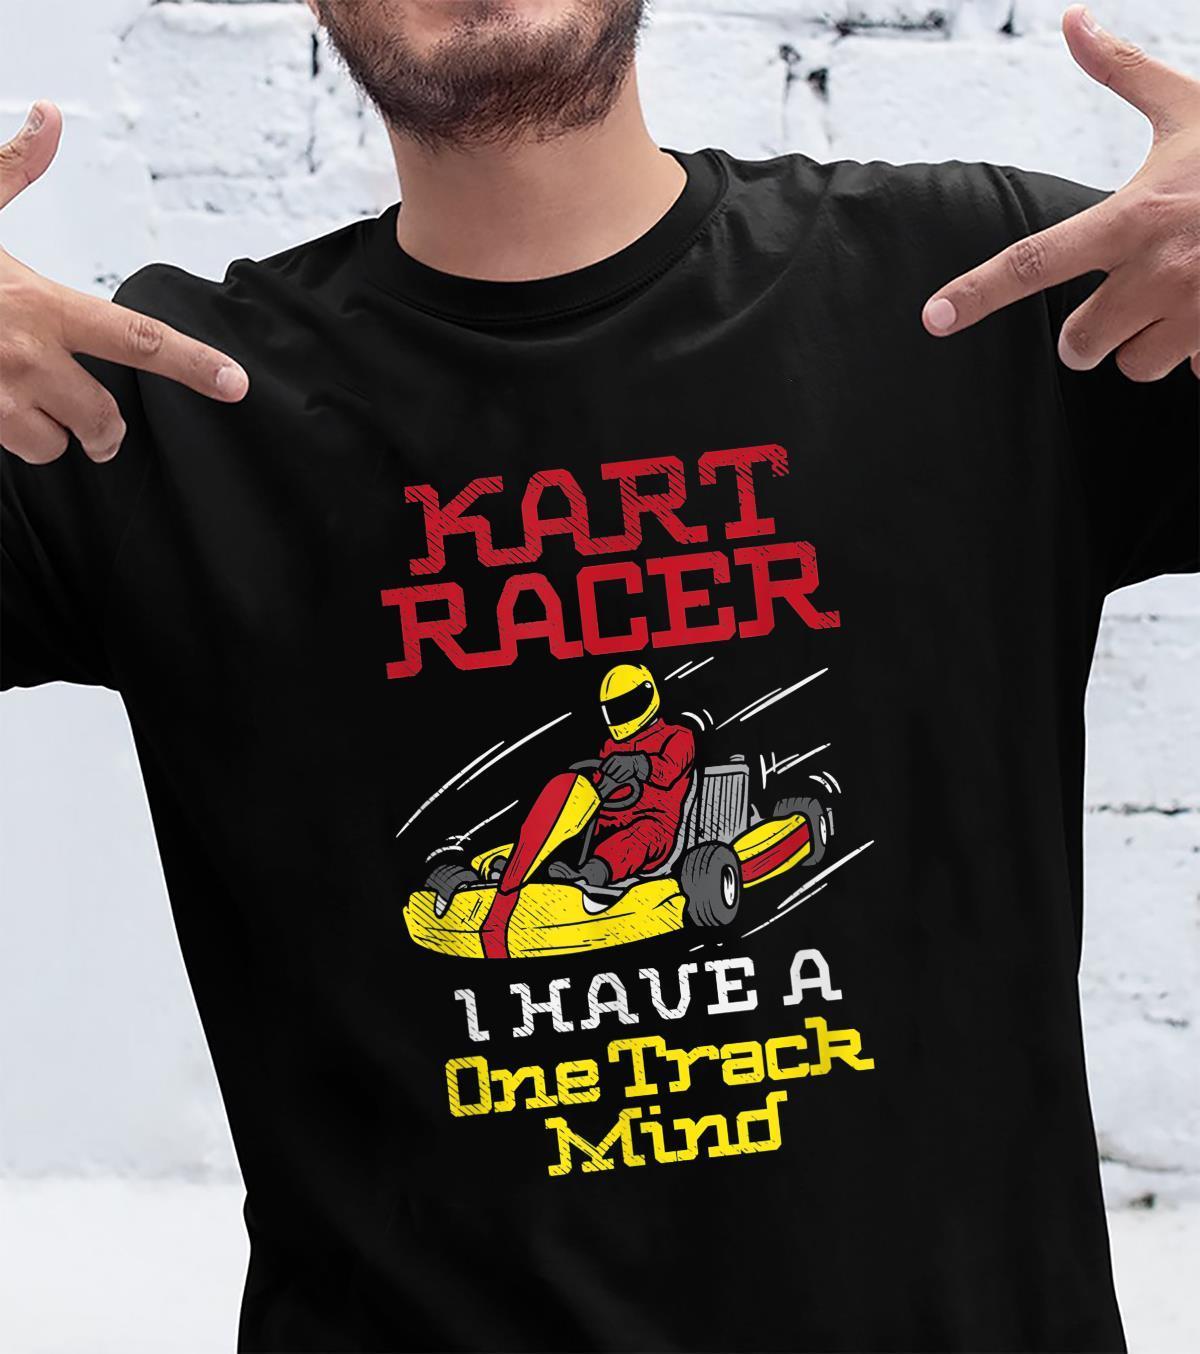 Ein Track Mind Go Kart Racing Kart Racer Karting Shirt